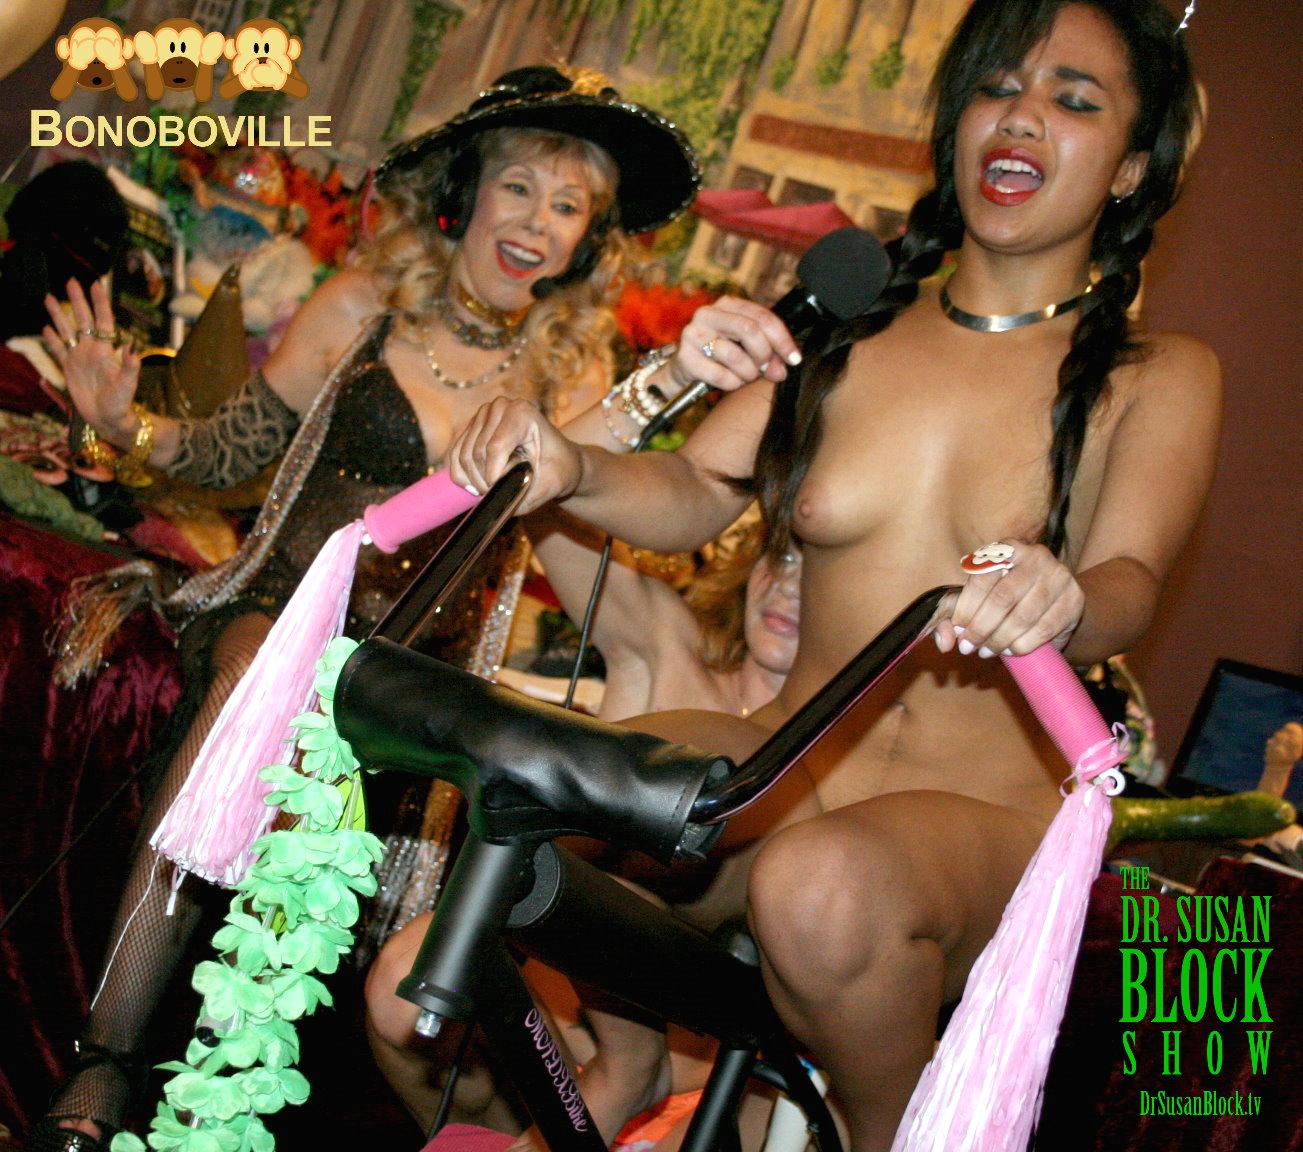 Loni rides the Mad X Bike into ecstasy. Photo: L'Erotique